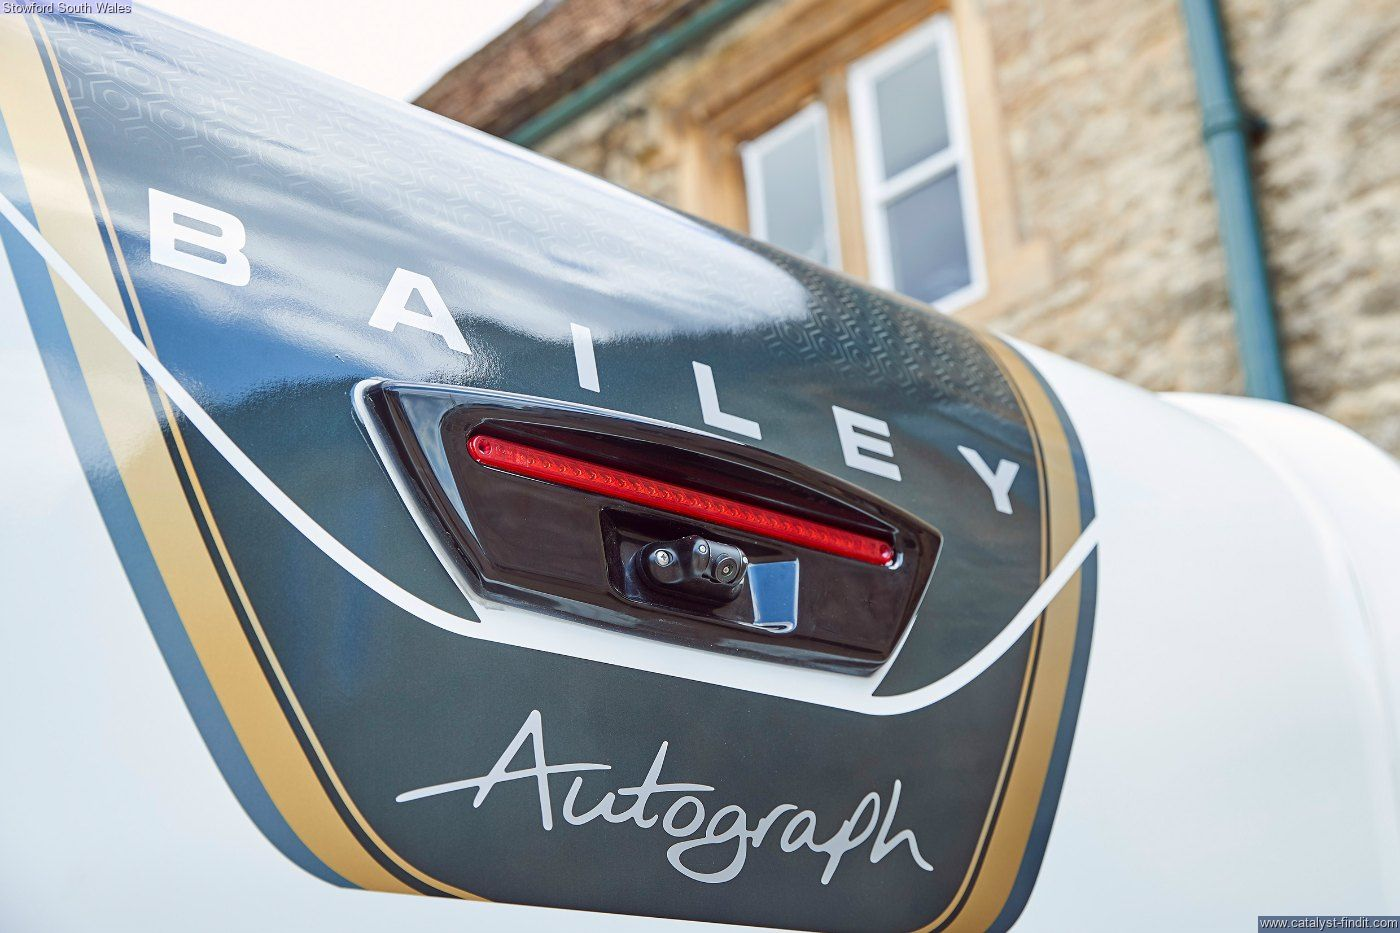 Bailey Autograph III 79-4T 2022